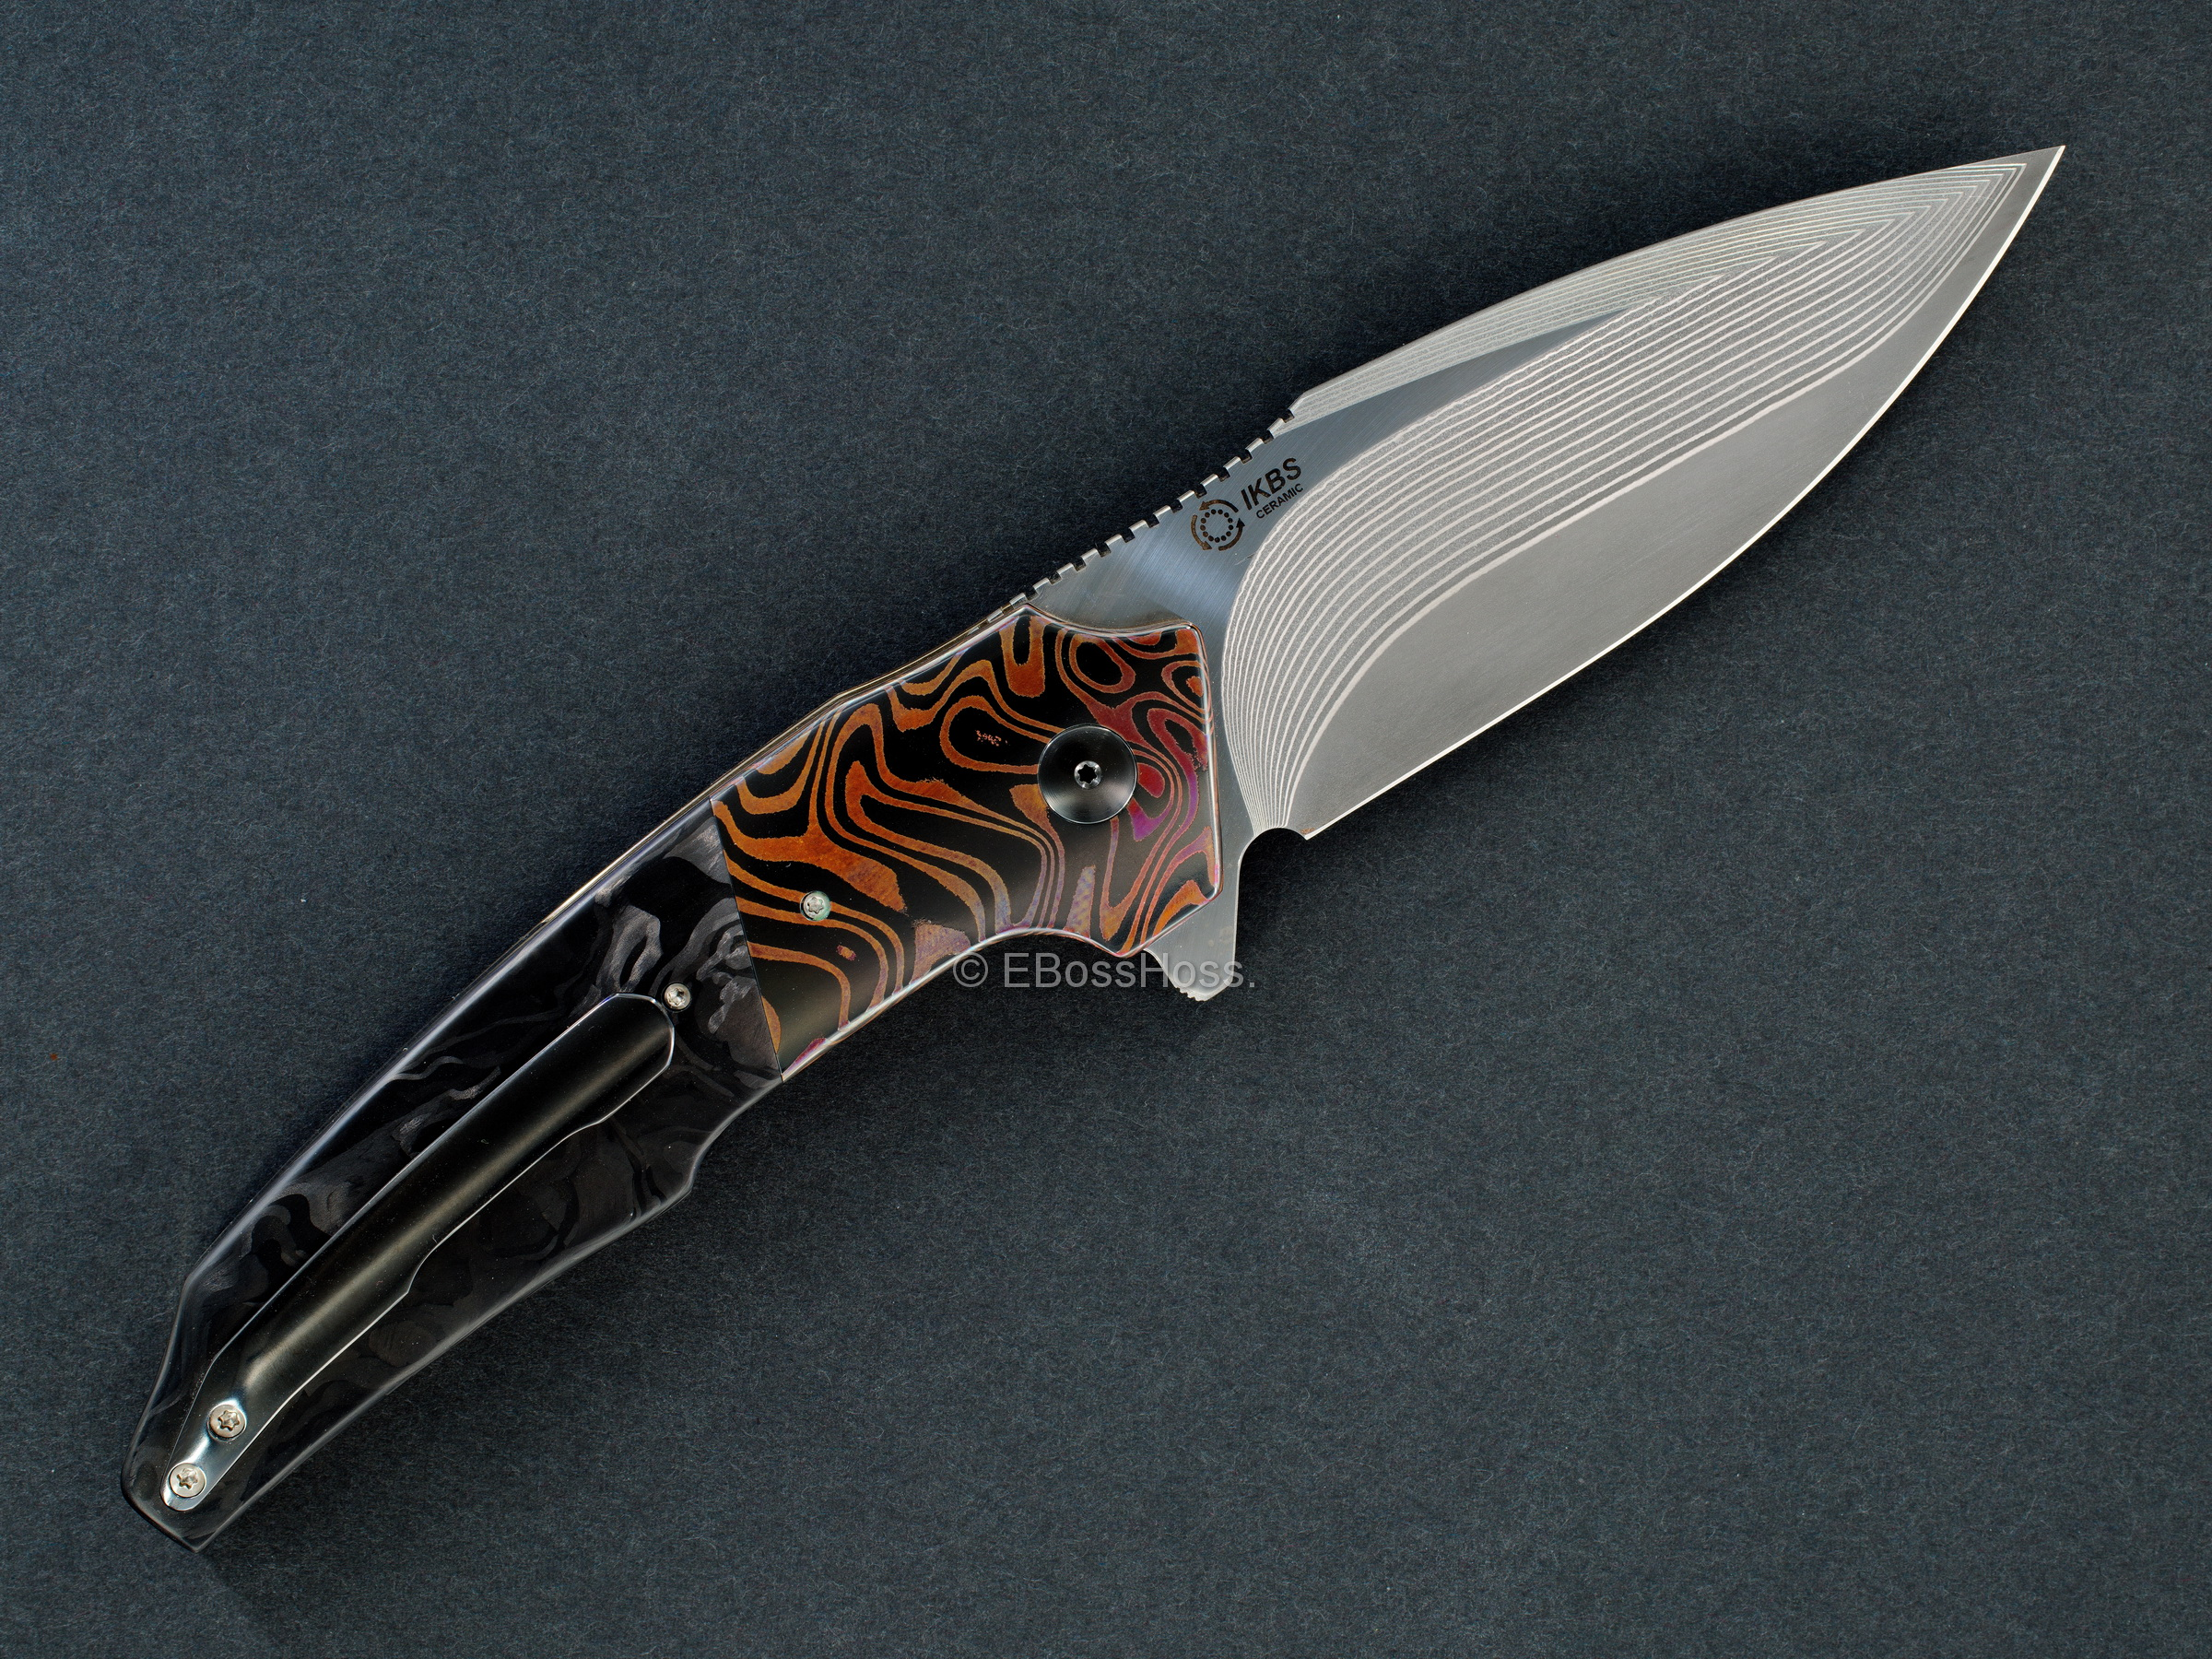 A2 Knives Custom A6 Premium Flipper